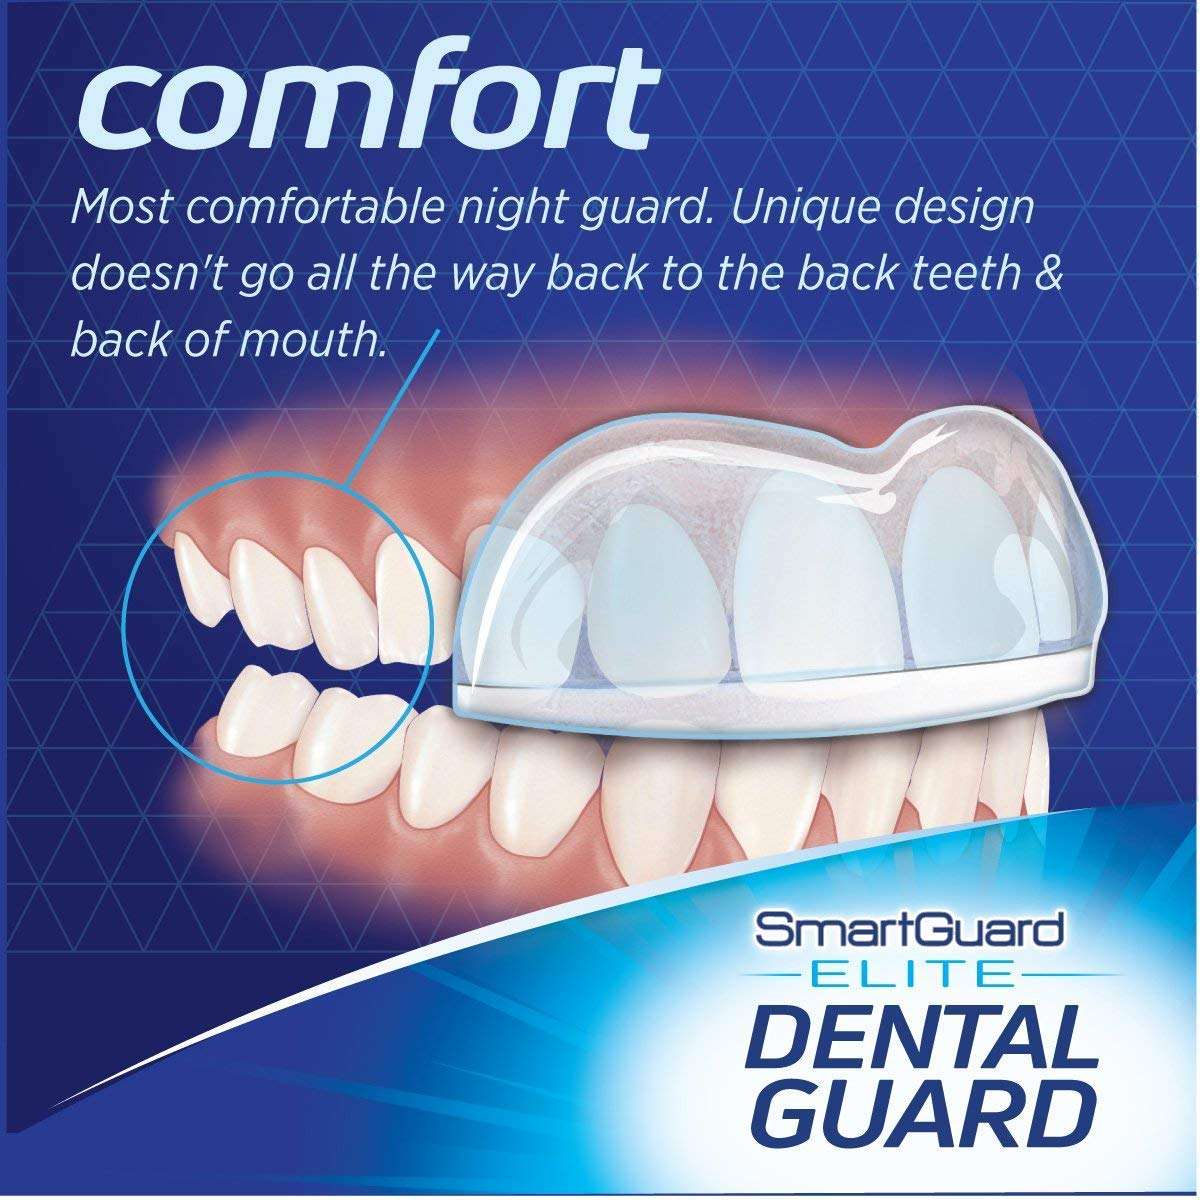 SmartGuard Elite Dental Guard 2-Pack: FREE BONUS - Travel Case – TMJ Dentist Designed for Clenching & Grinding - Bruxing Splint Mouth Protector for Relief by SmartGuard (Image #4)